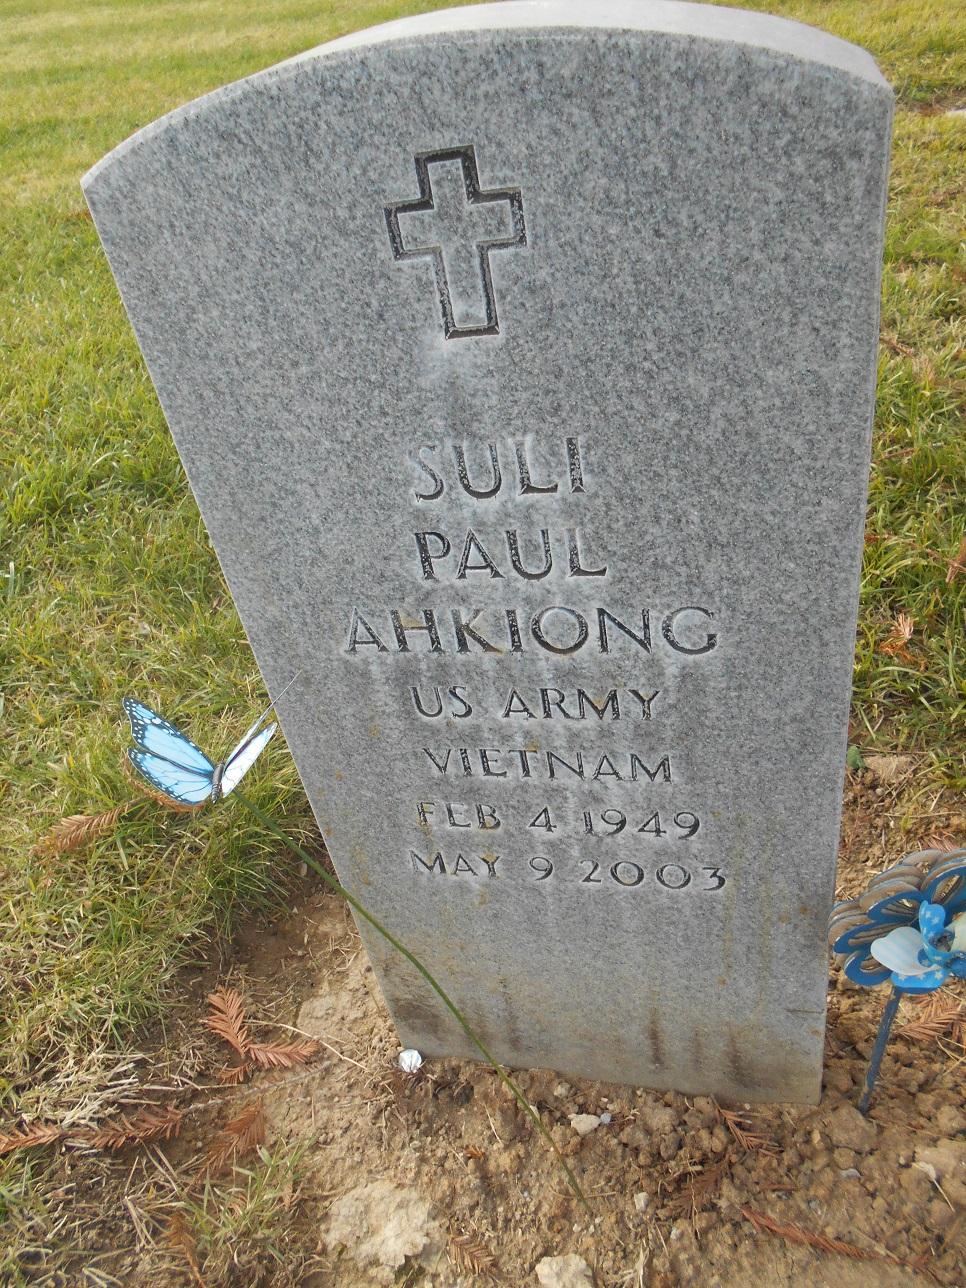 Suli Paul Ahkiong